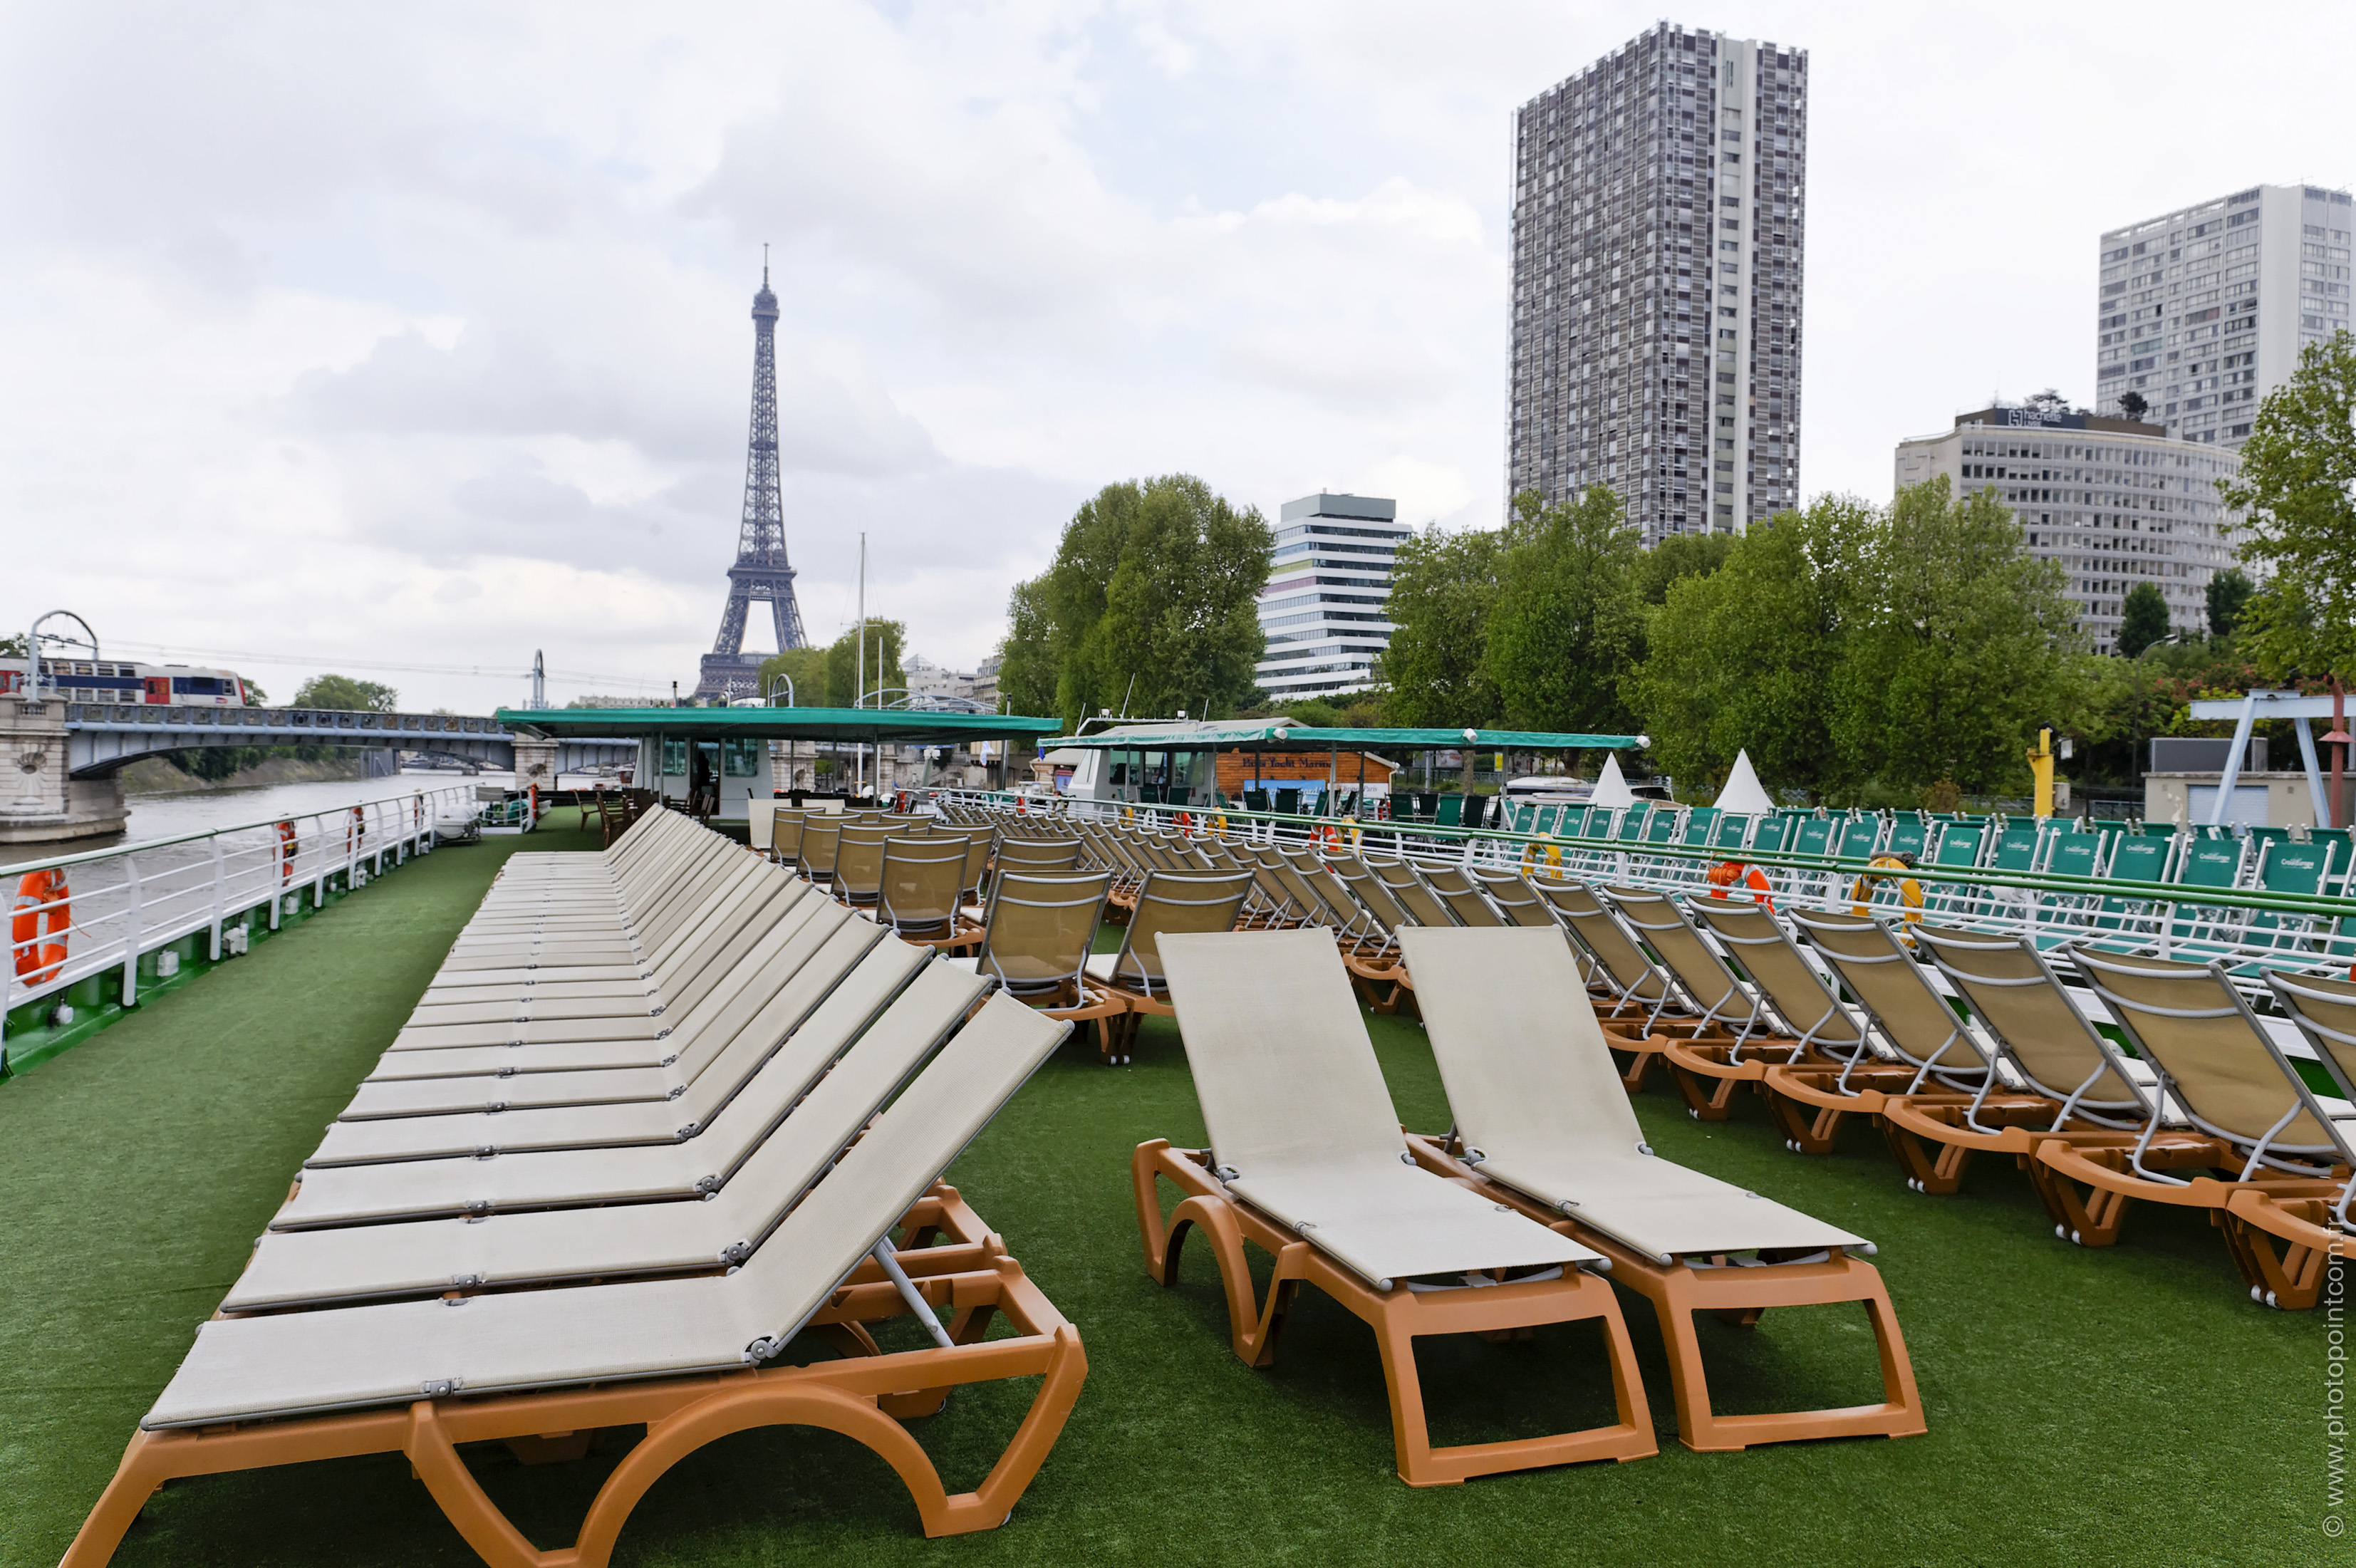 CroisiEurope MS Botticelli Exterior Sun Deck Lounge Chairs.jpg